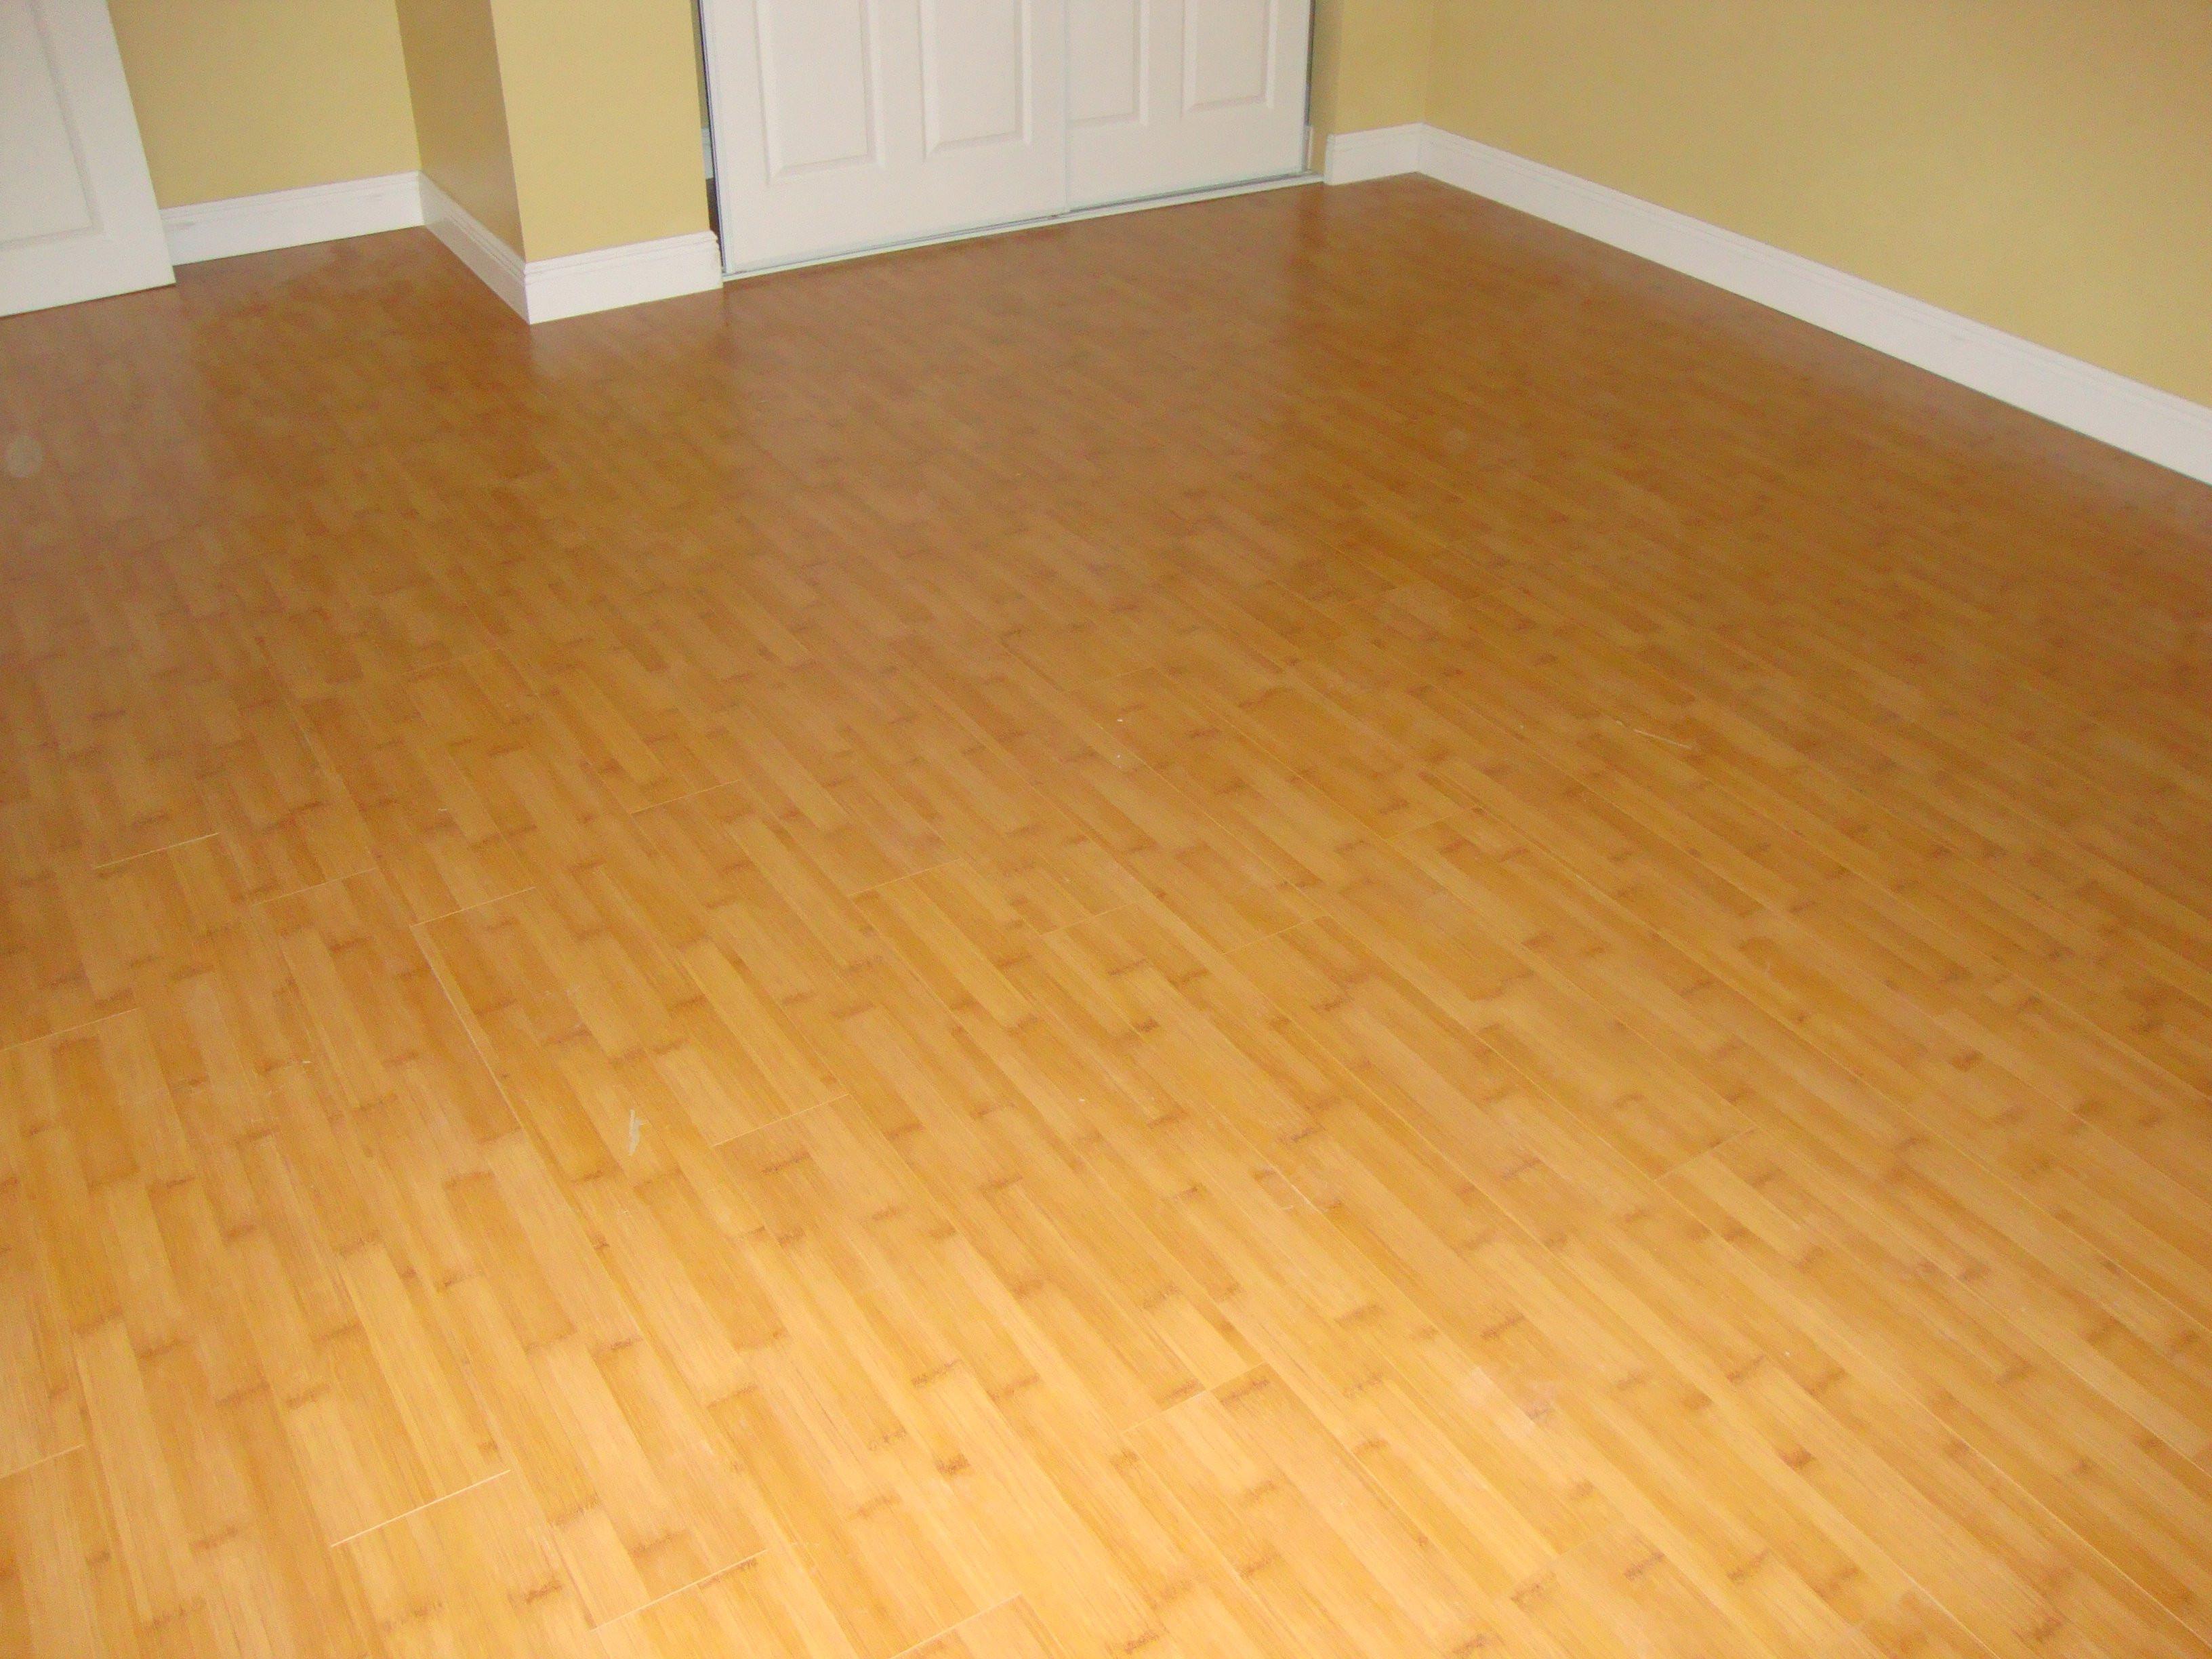 prefinished bamboo hardwood flooring of can you refinish bamboo floors floor pertaining to can you refinish bamboo floors hardwood floor design wide plank hardwood flooring maple hardwood